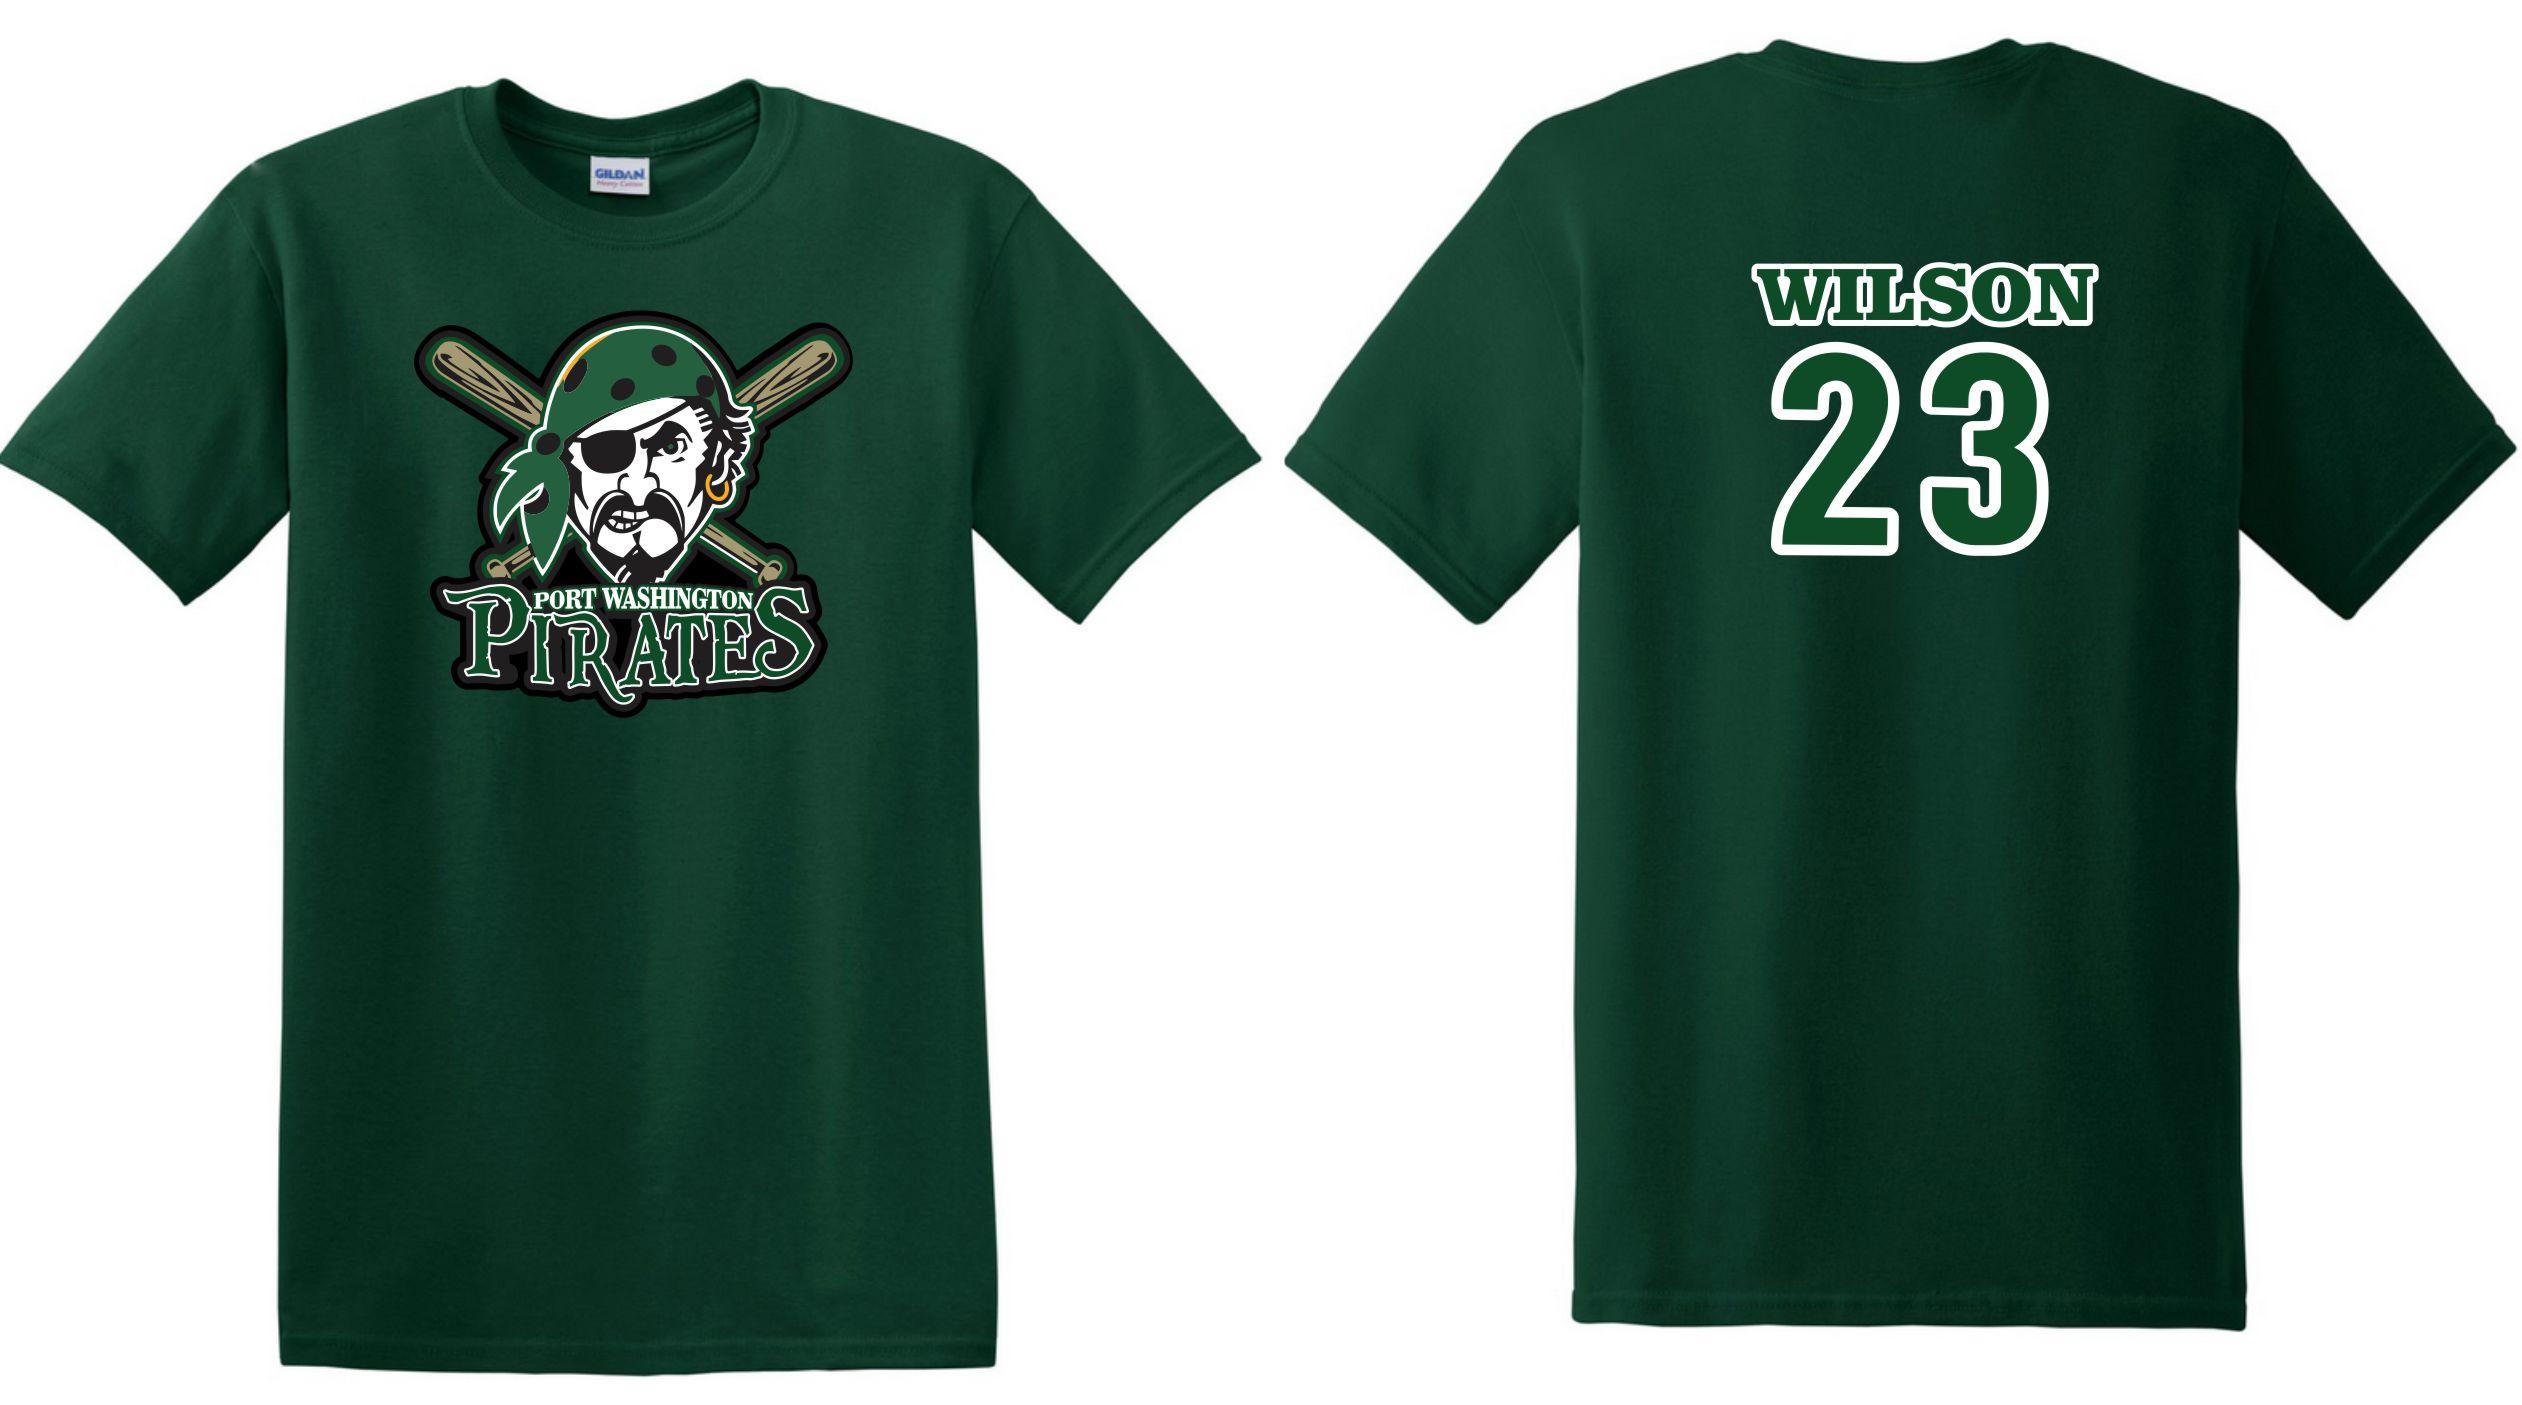 T shirt design youth - Port Washington Lady Pirates Baseball Softball Custom Baseball T Shirts